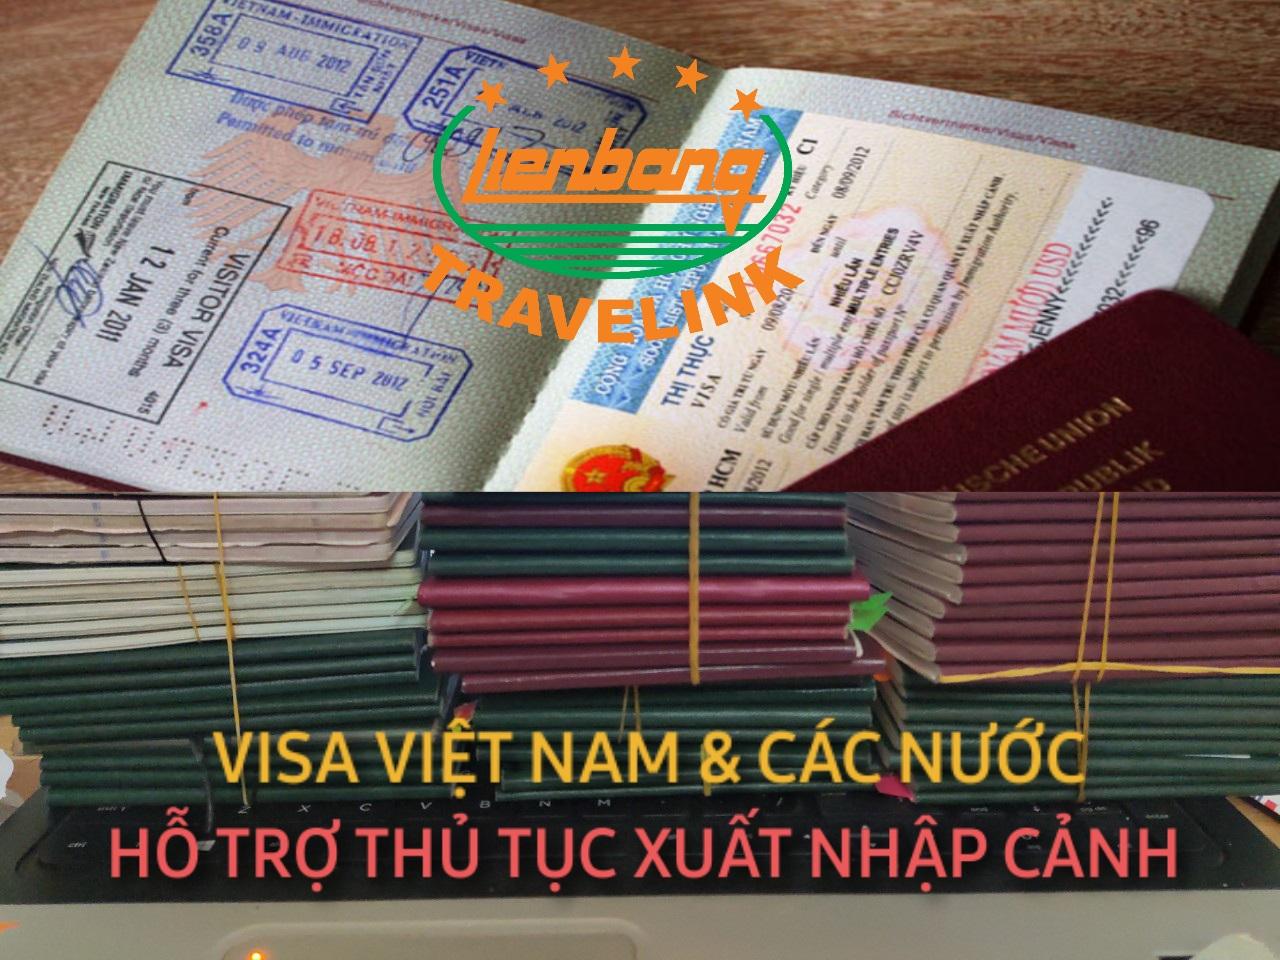 1614929534_460_passport-visa-vn2.jpg